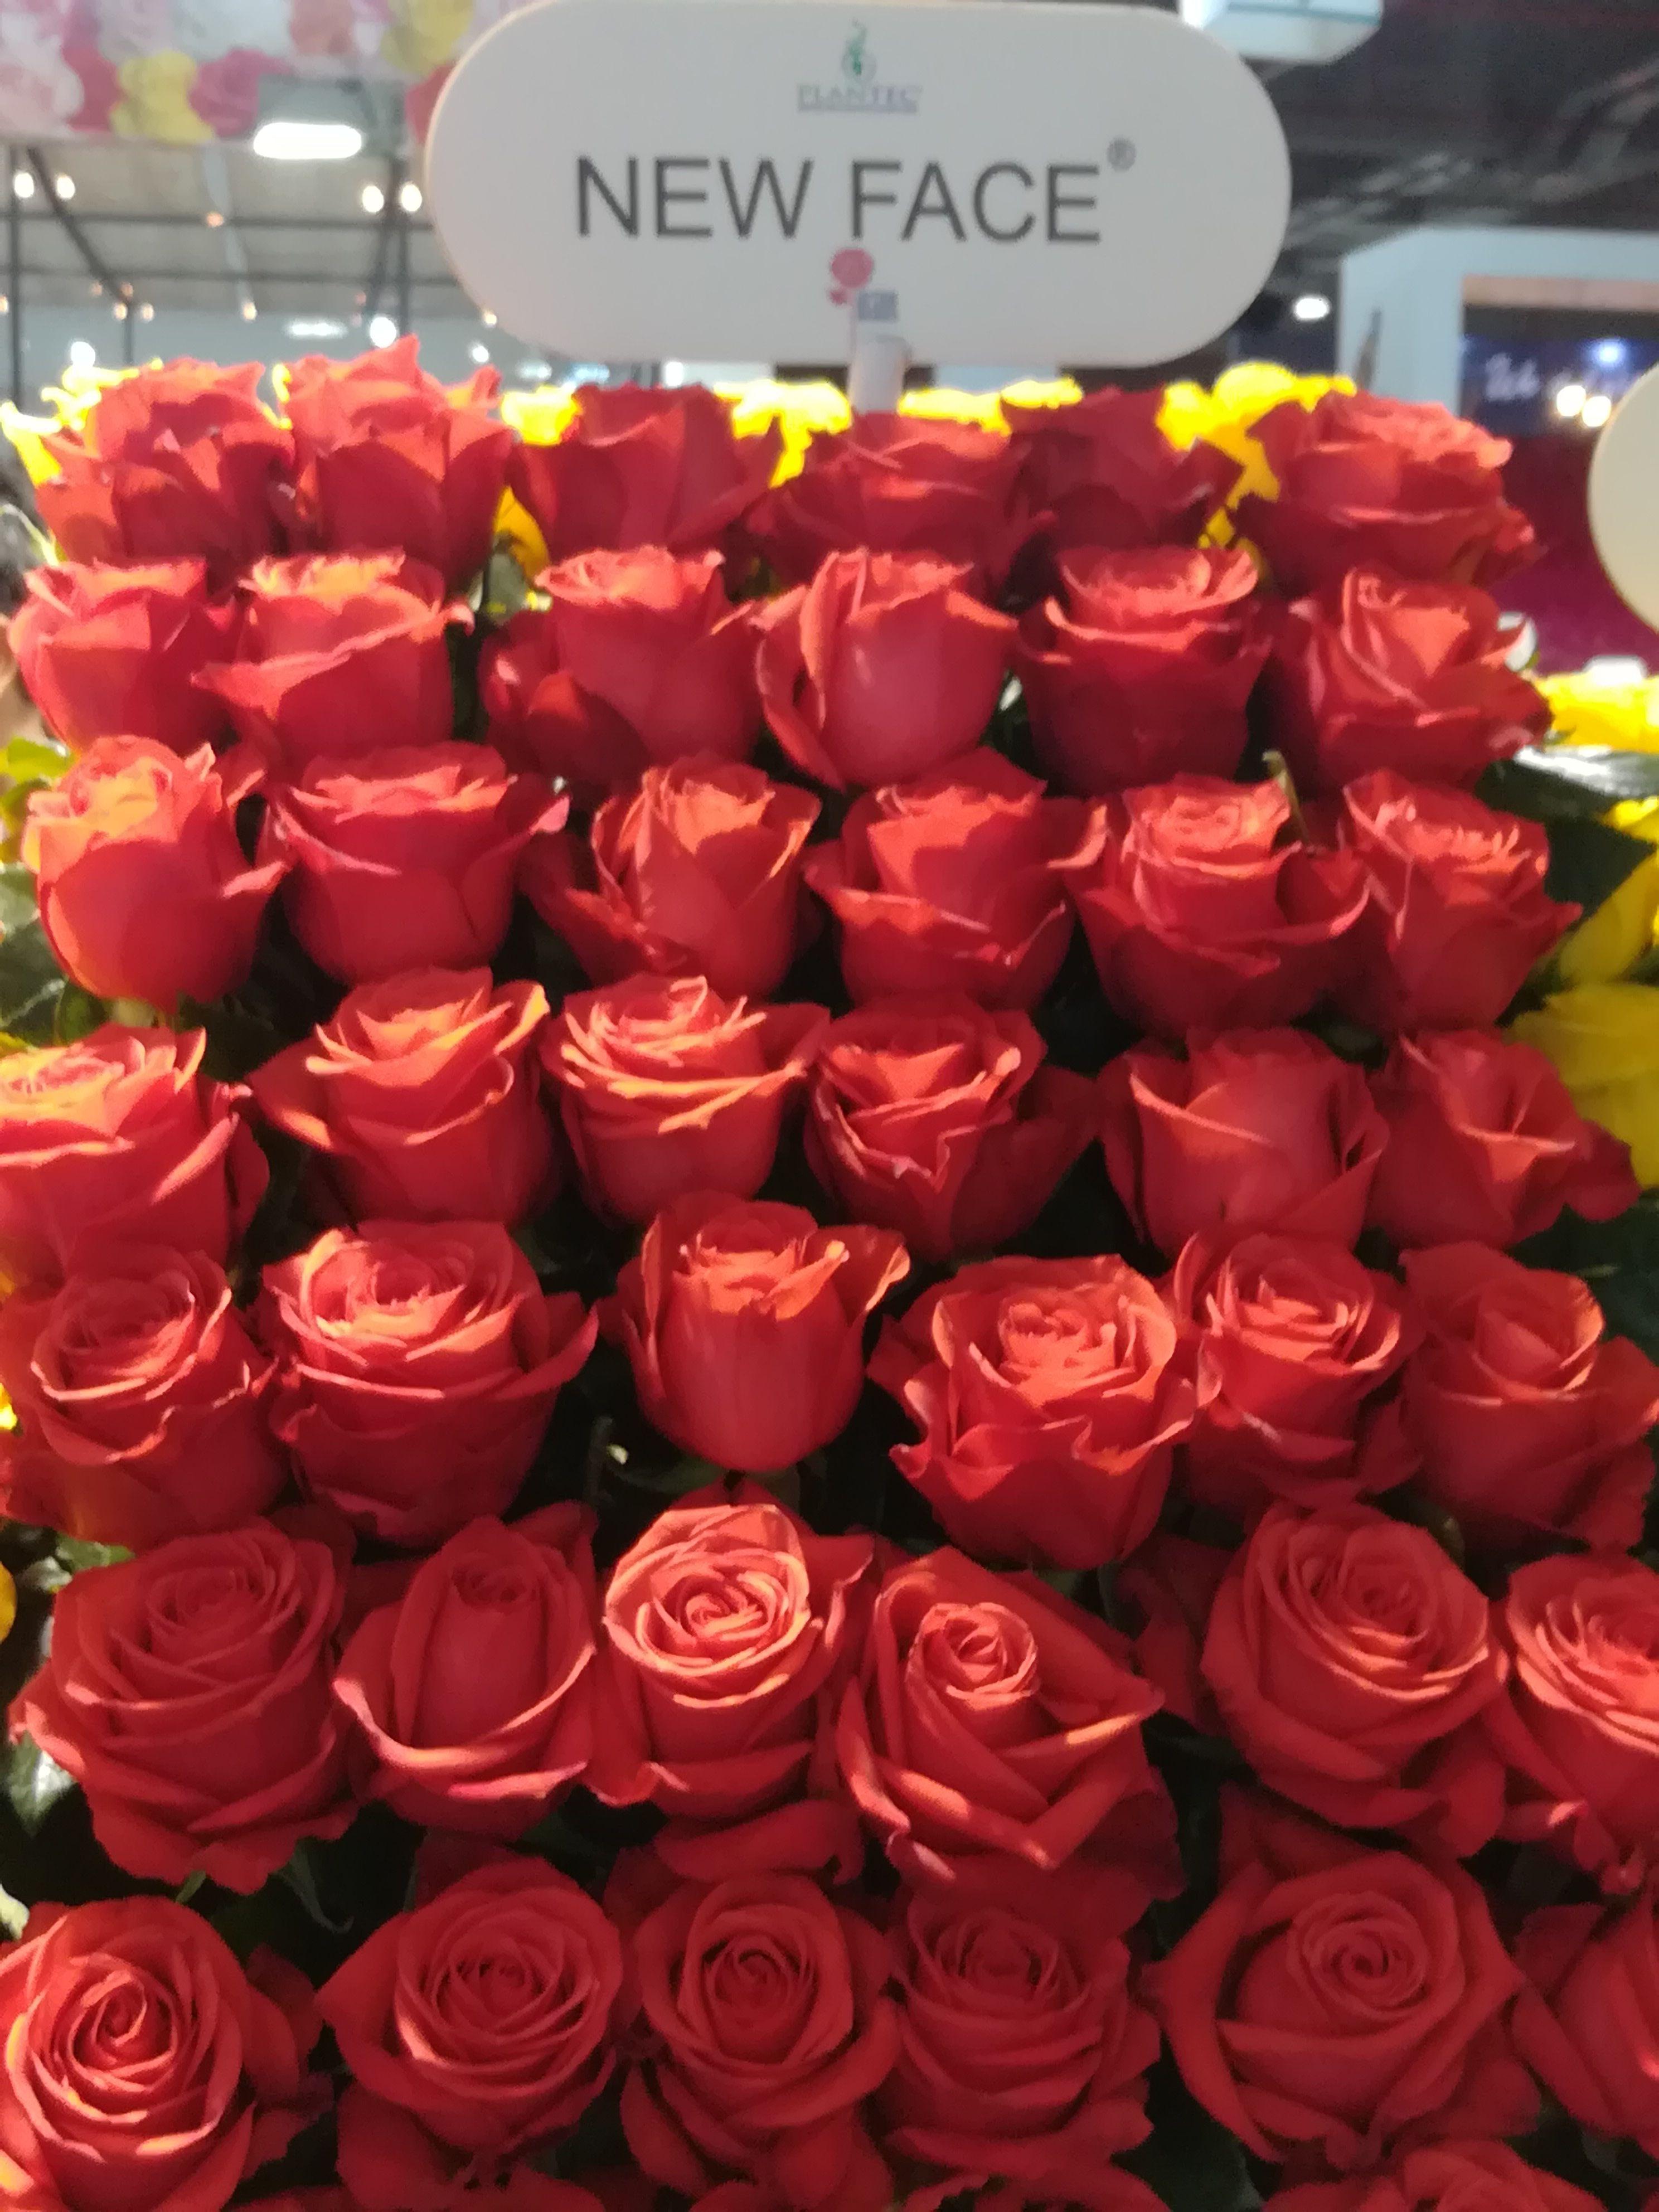 Where to Buy Bulk Flowers Online for Your Wedding Roses